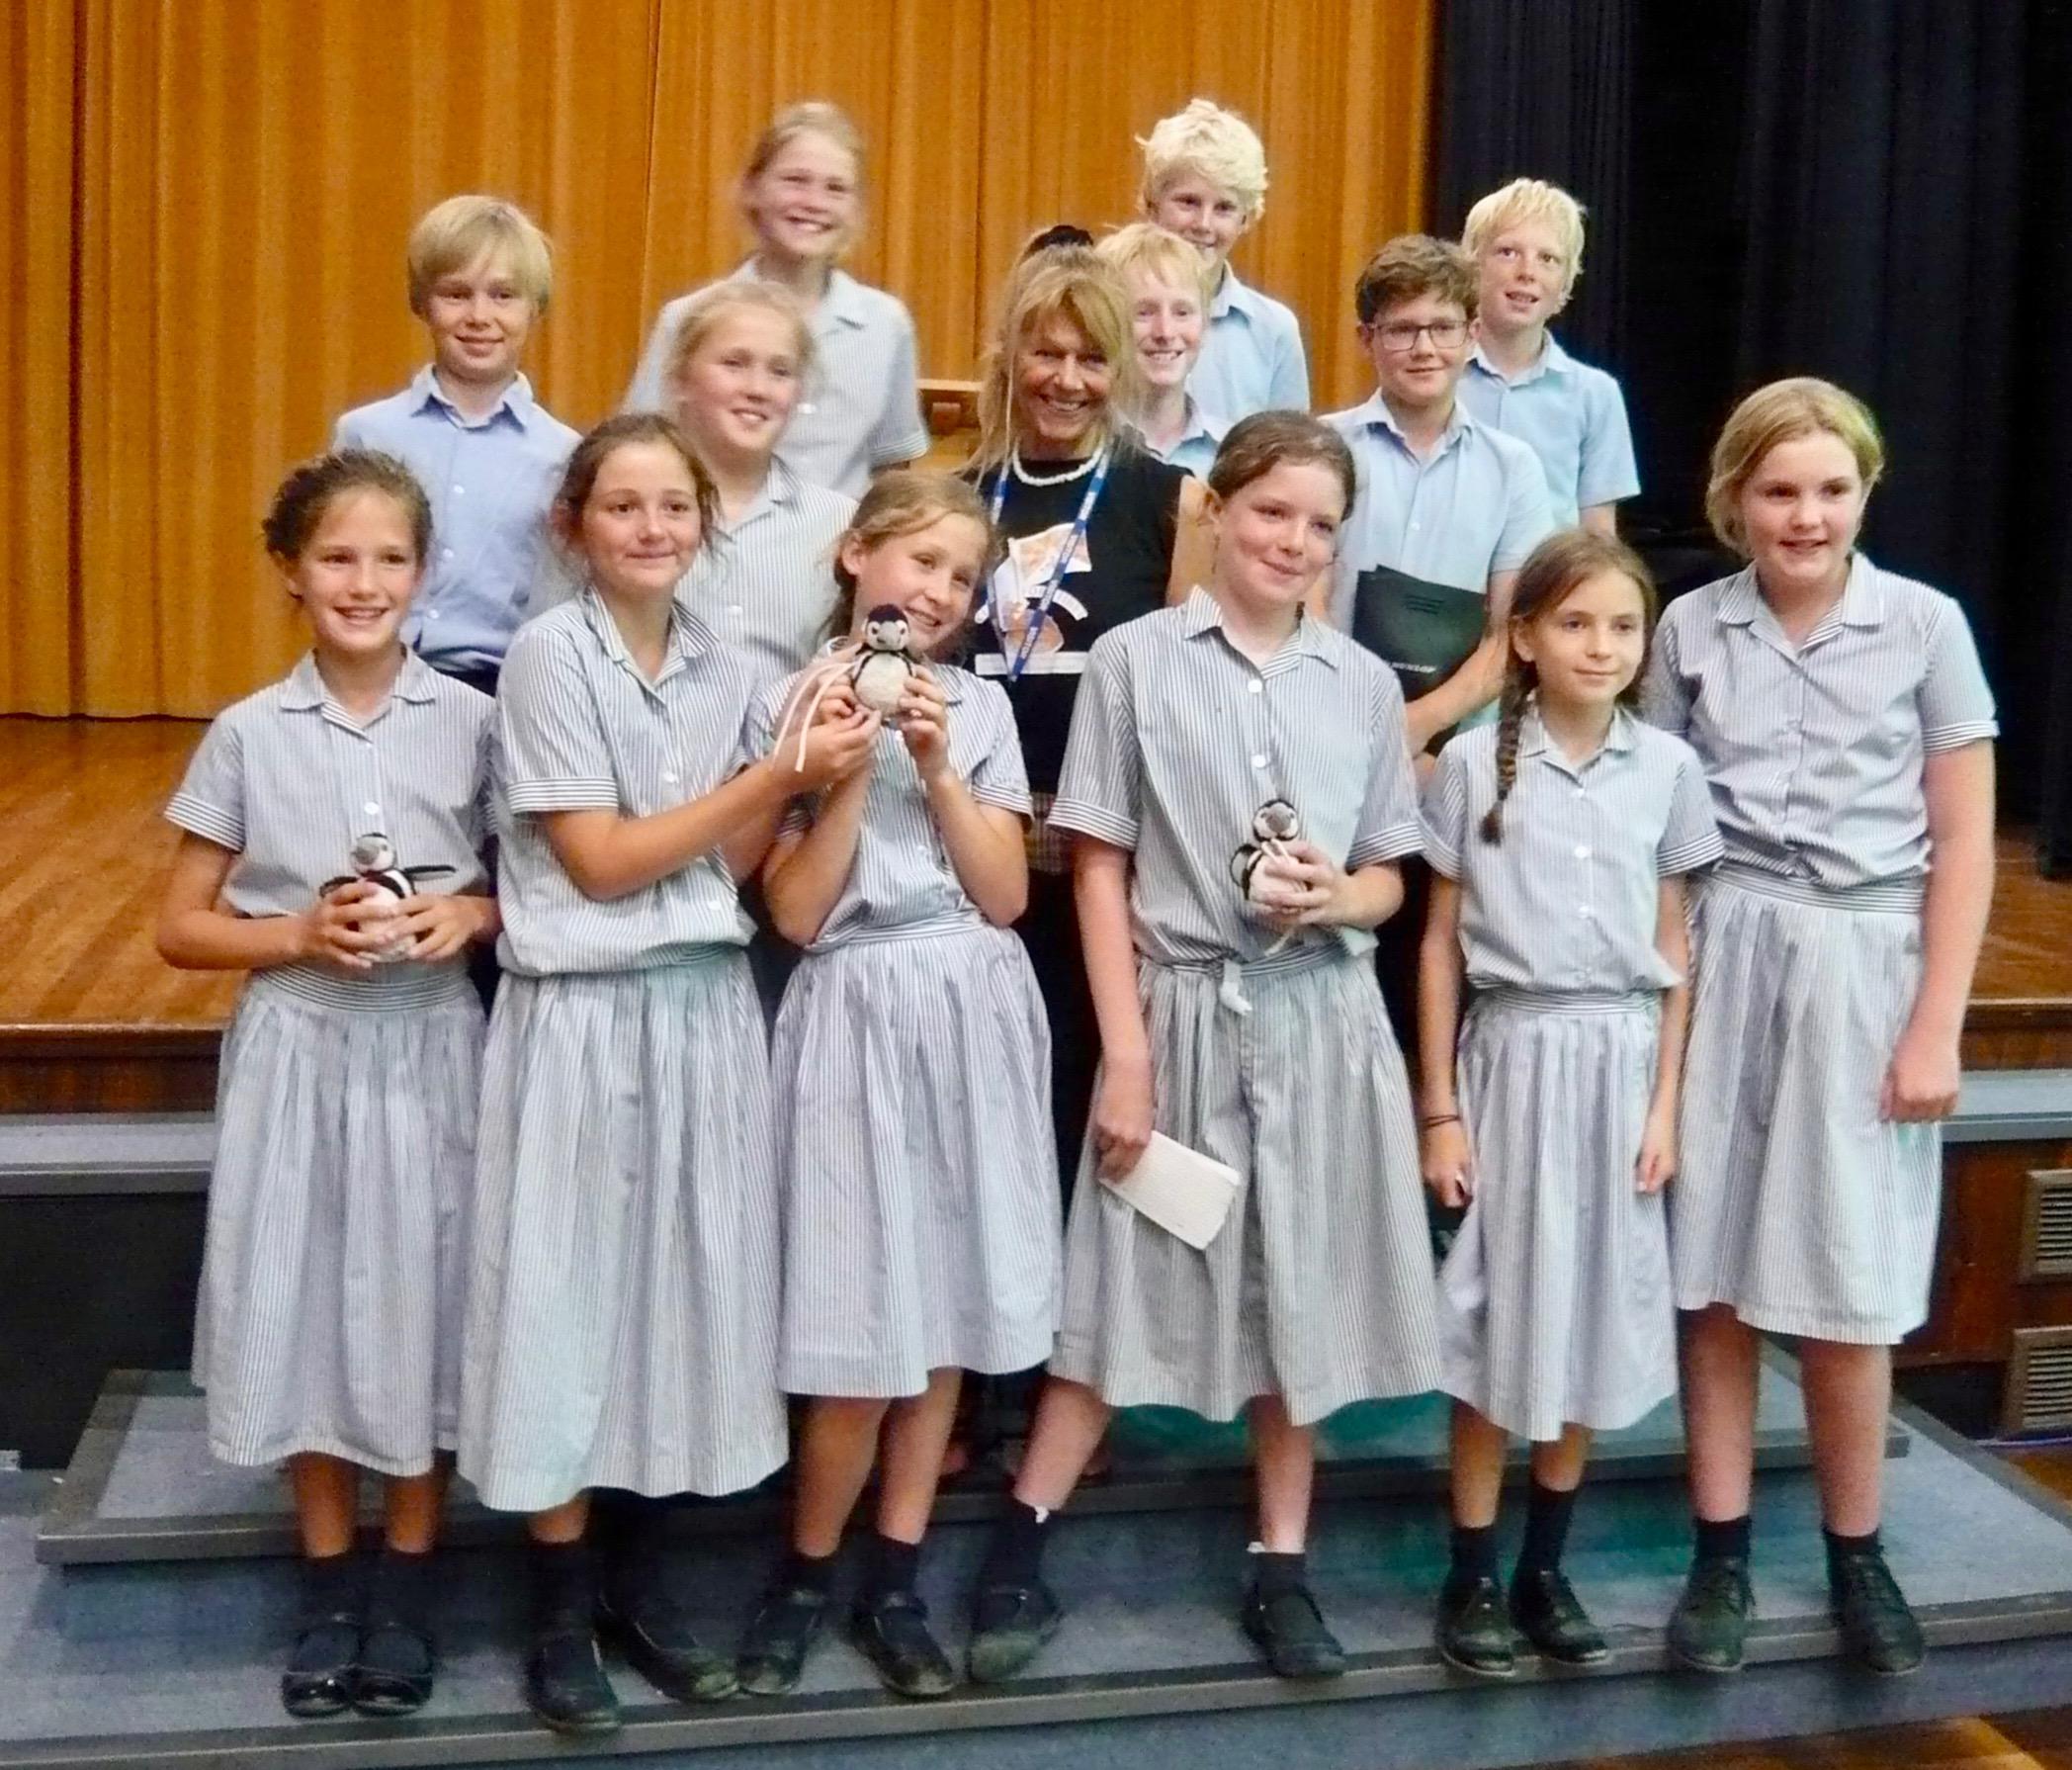 School Children Pledges